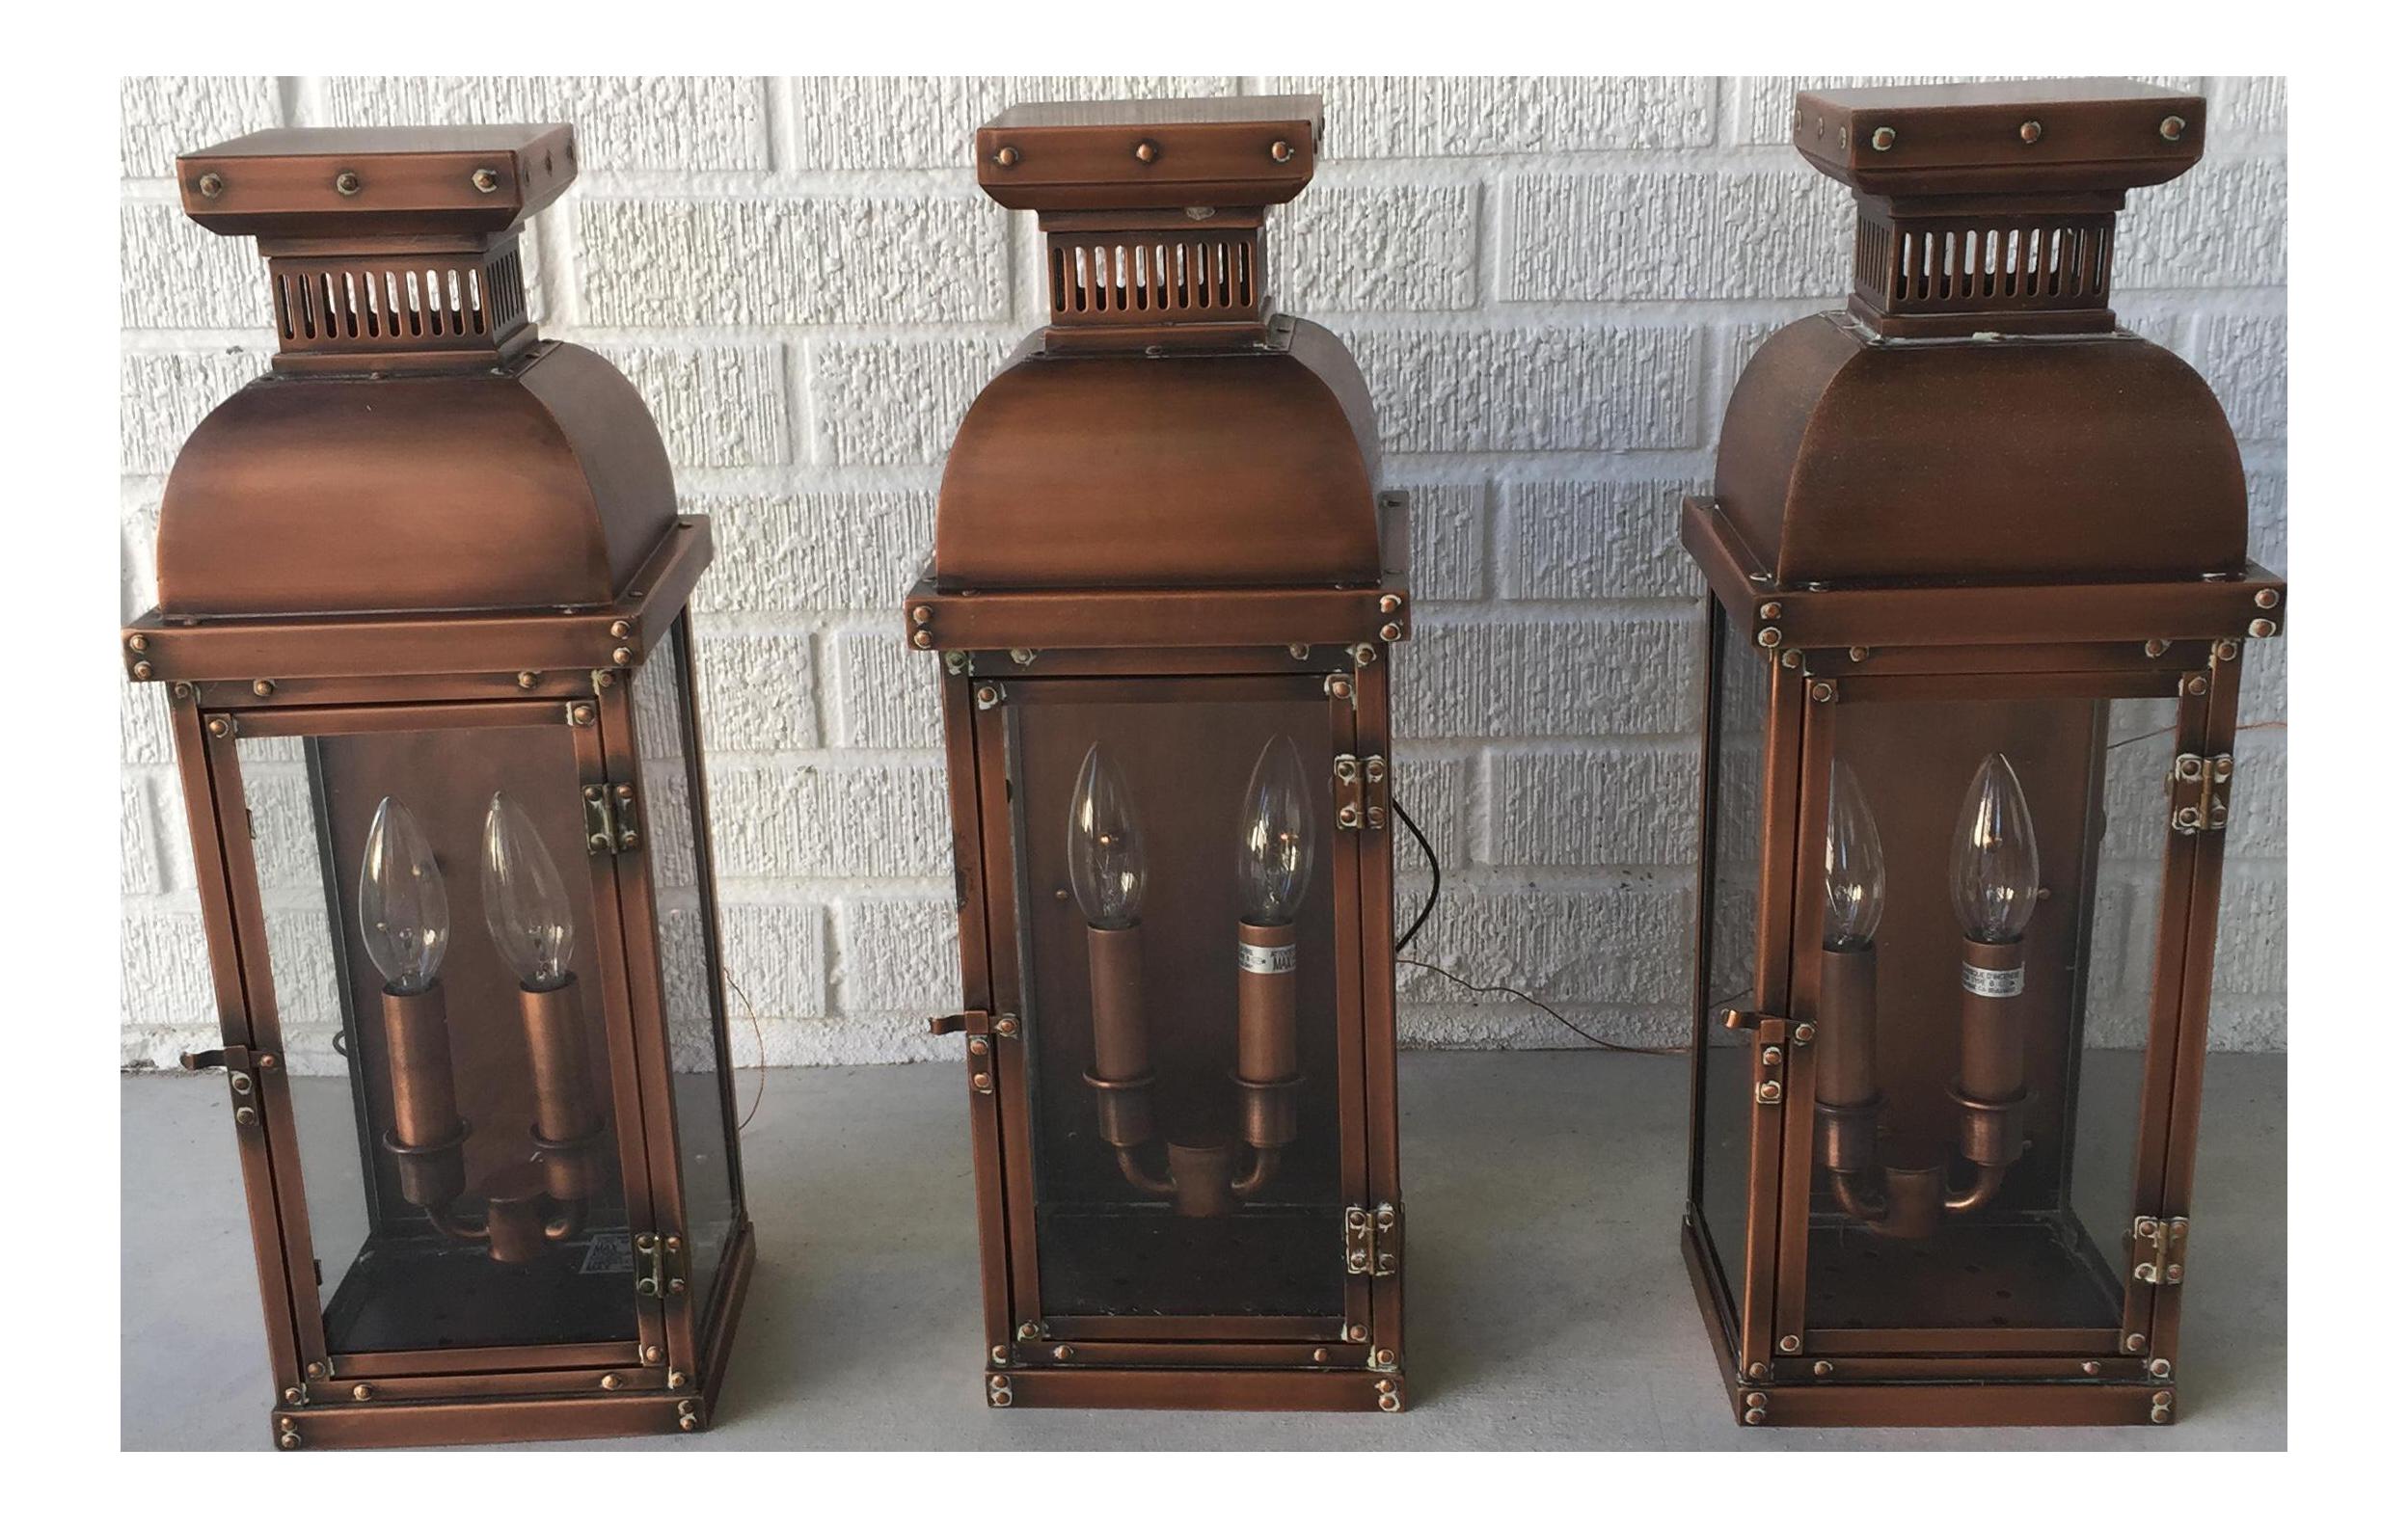 Shop 300 Used Vintage Lanterns at Chairishcom